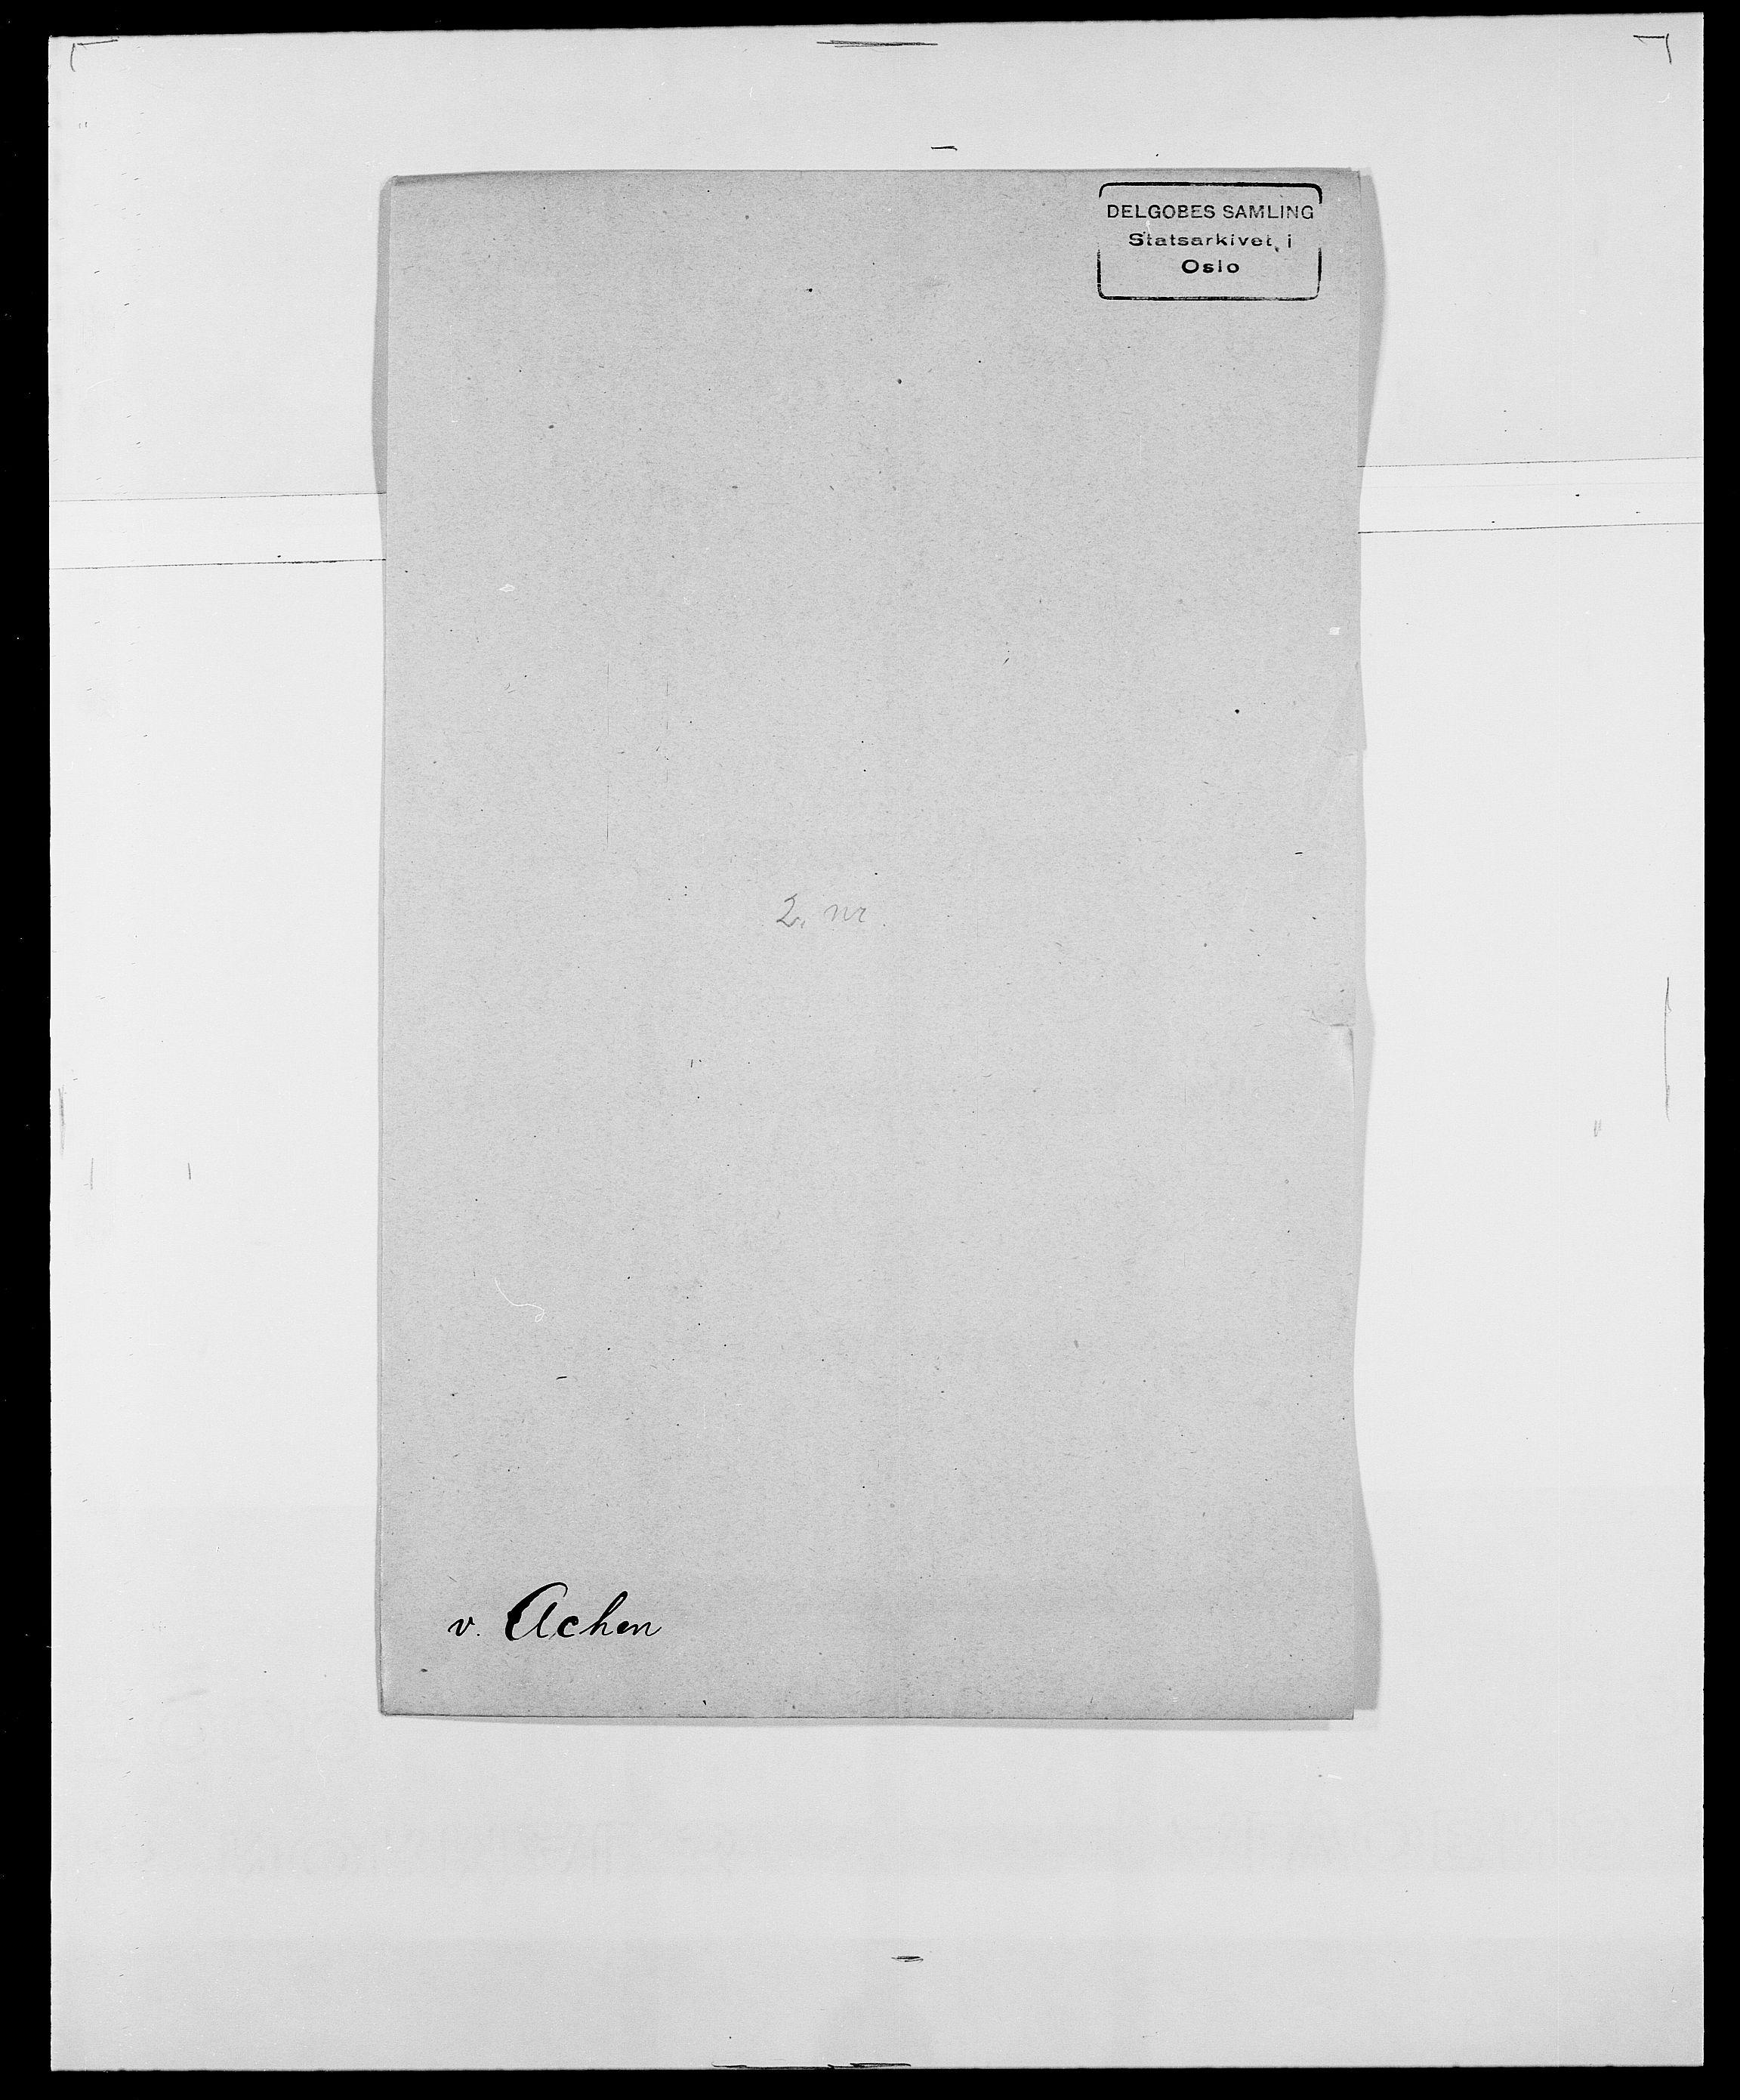 SAO, Delgobe, Charles Antoine - samling, D/Da/L0001: Aabye - Angerman, s. 237